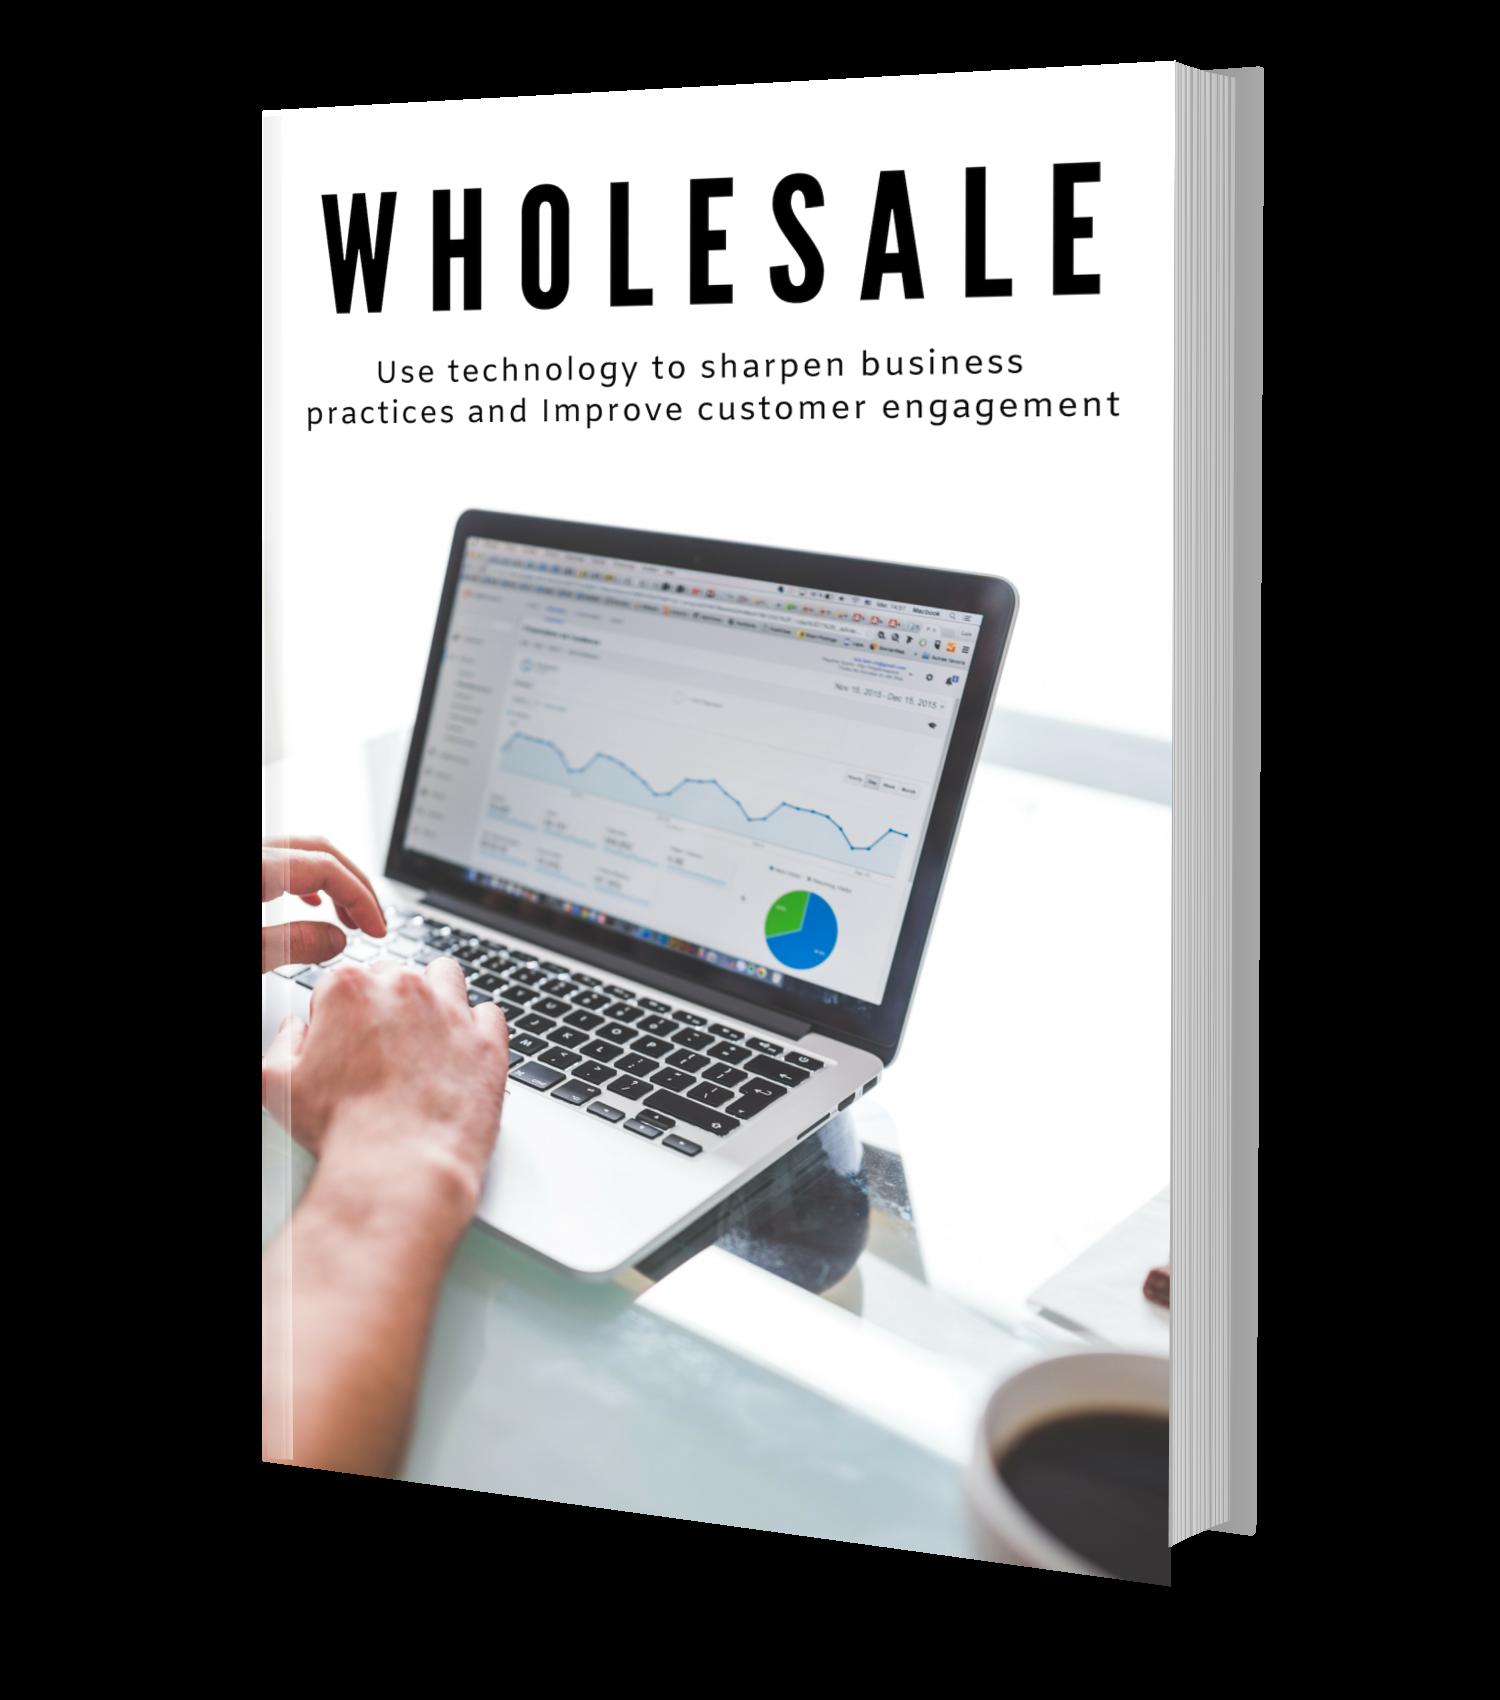 B1-TOFU-WP-IDC-Wholesale-Tech ebook